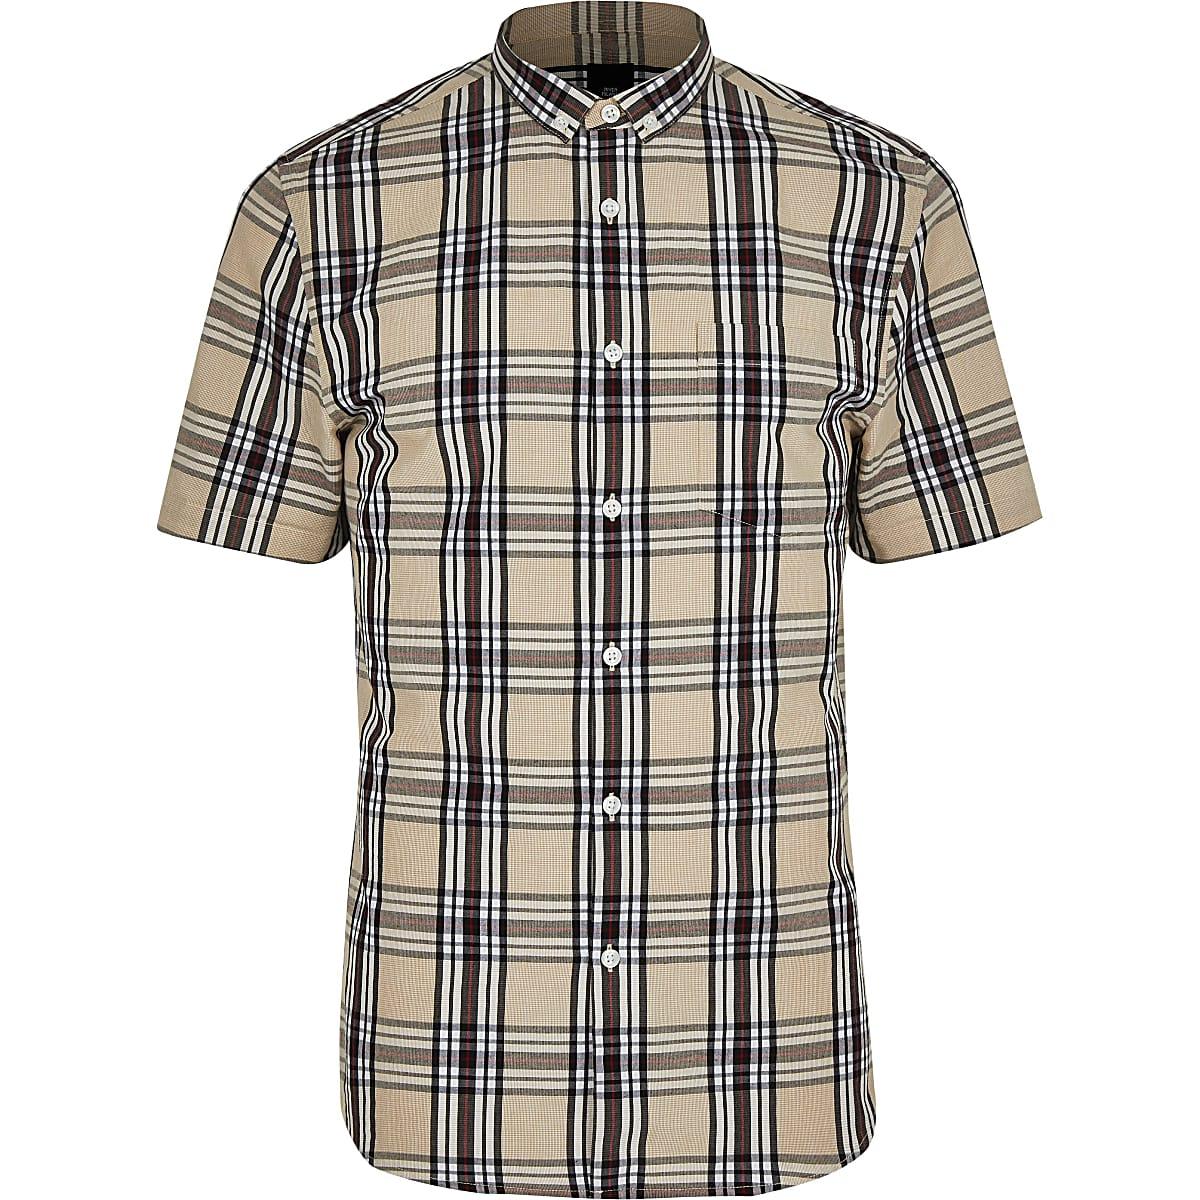 Big and Tall slim fit stone check shirt